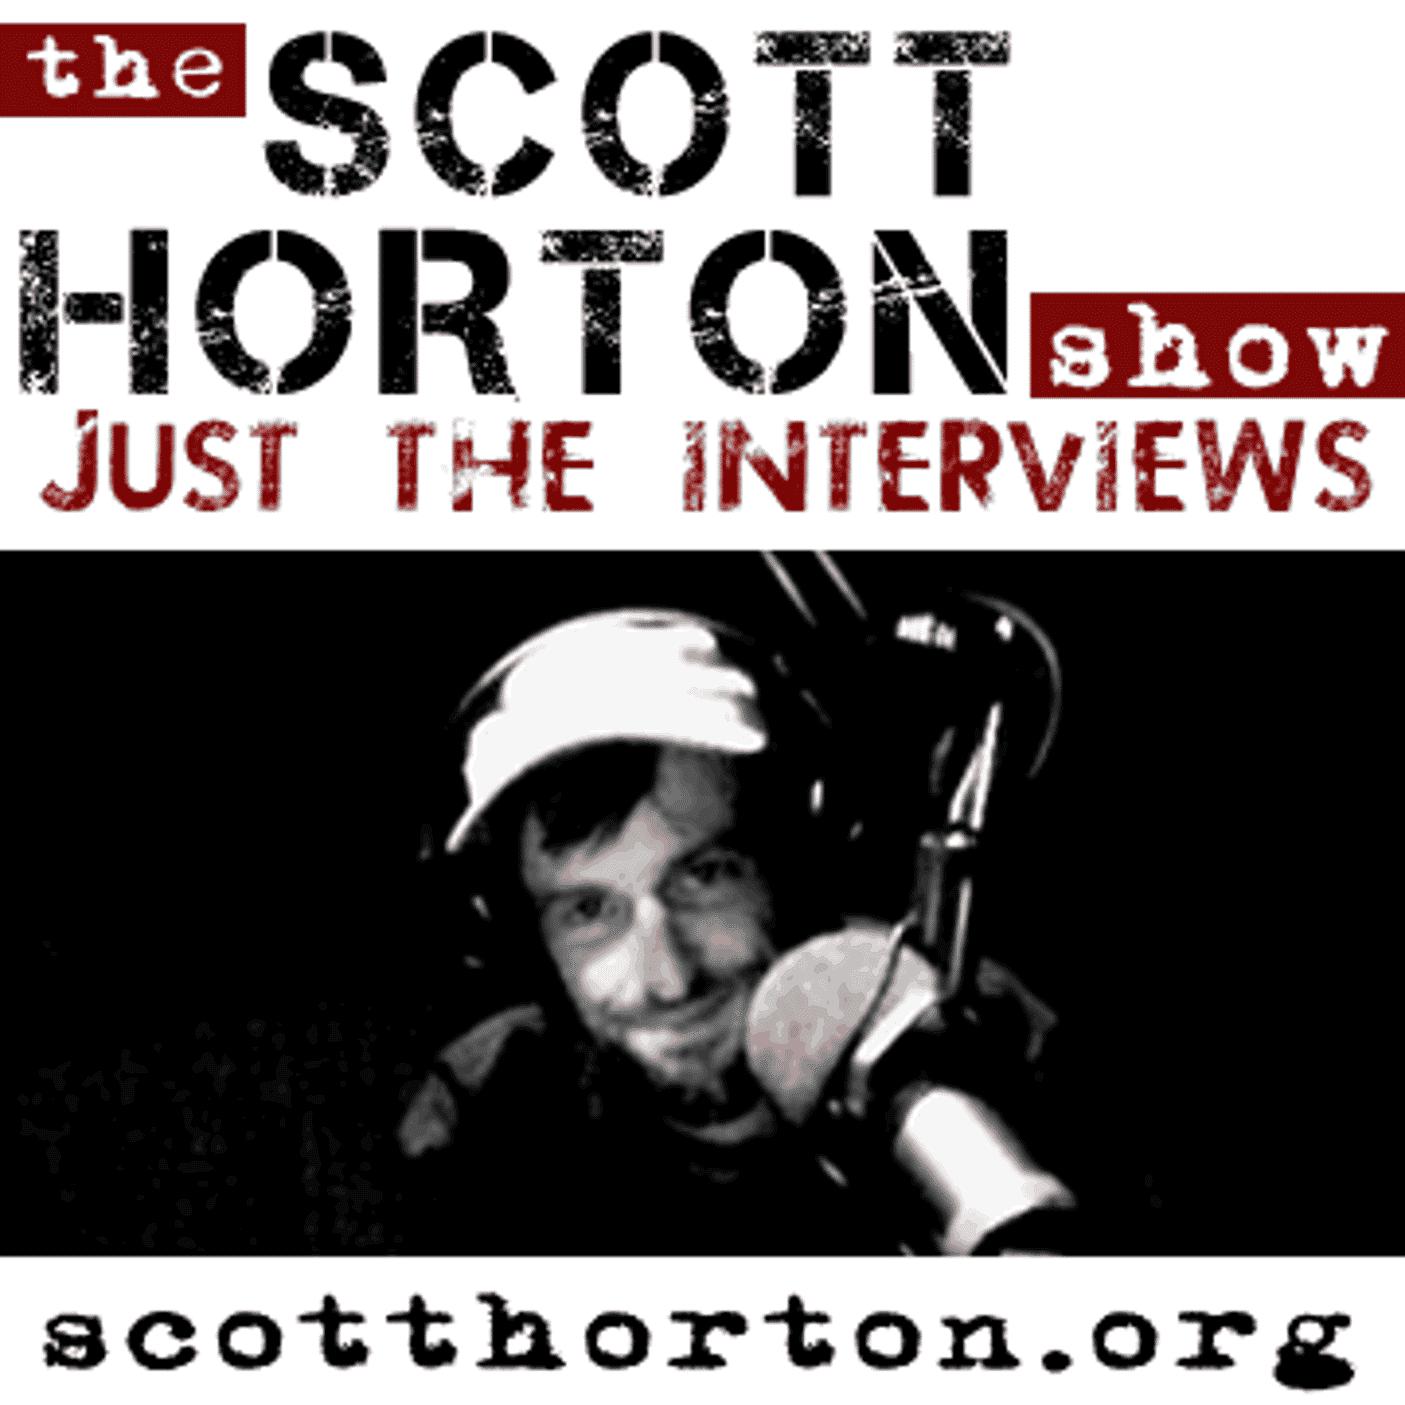 Scott Horton Show - Just the Interviews